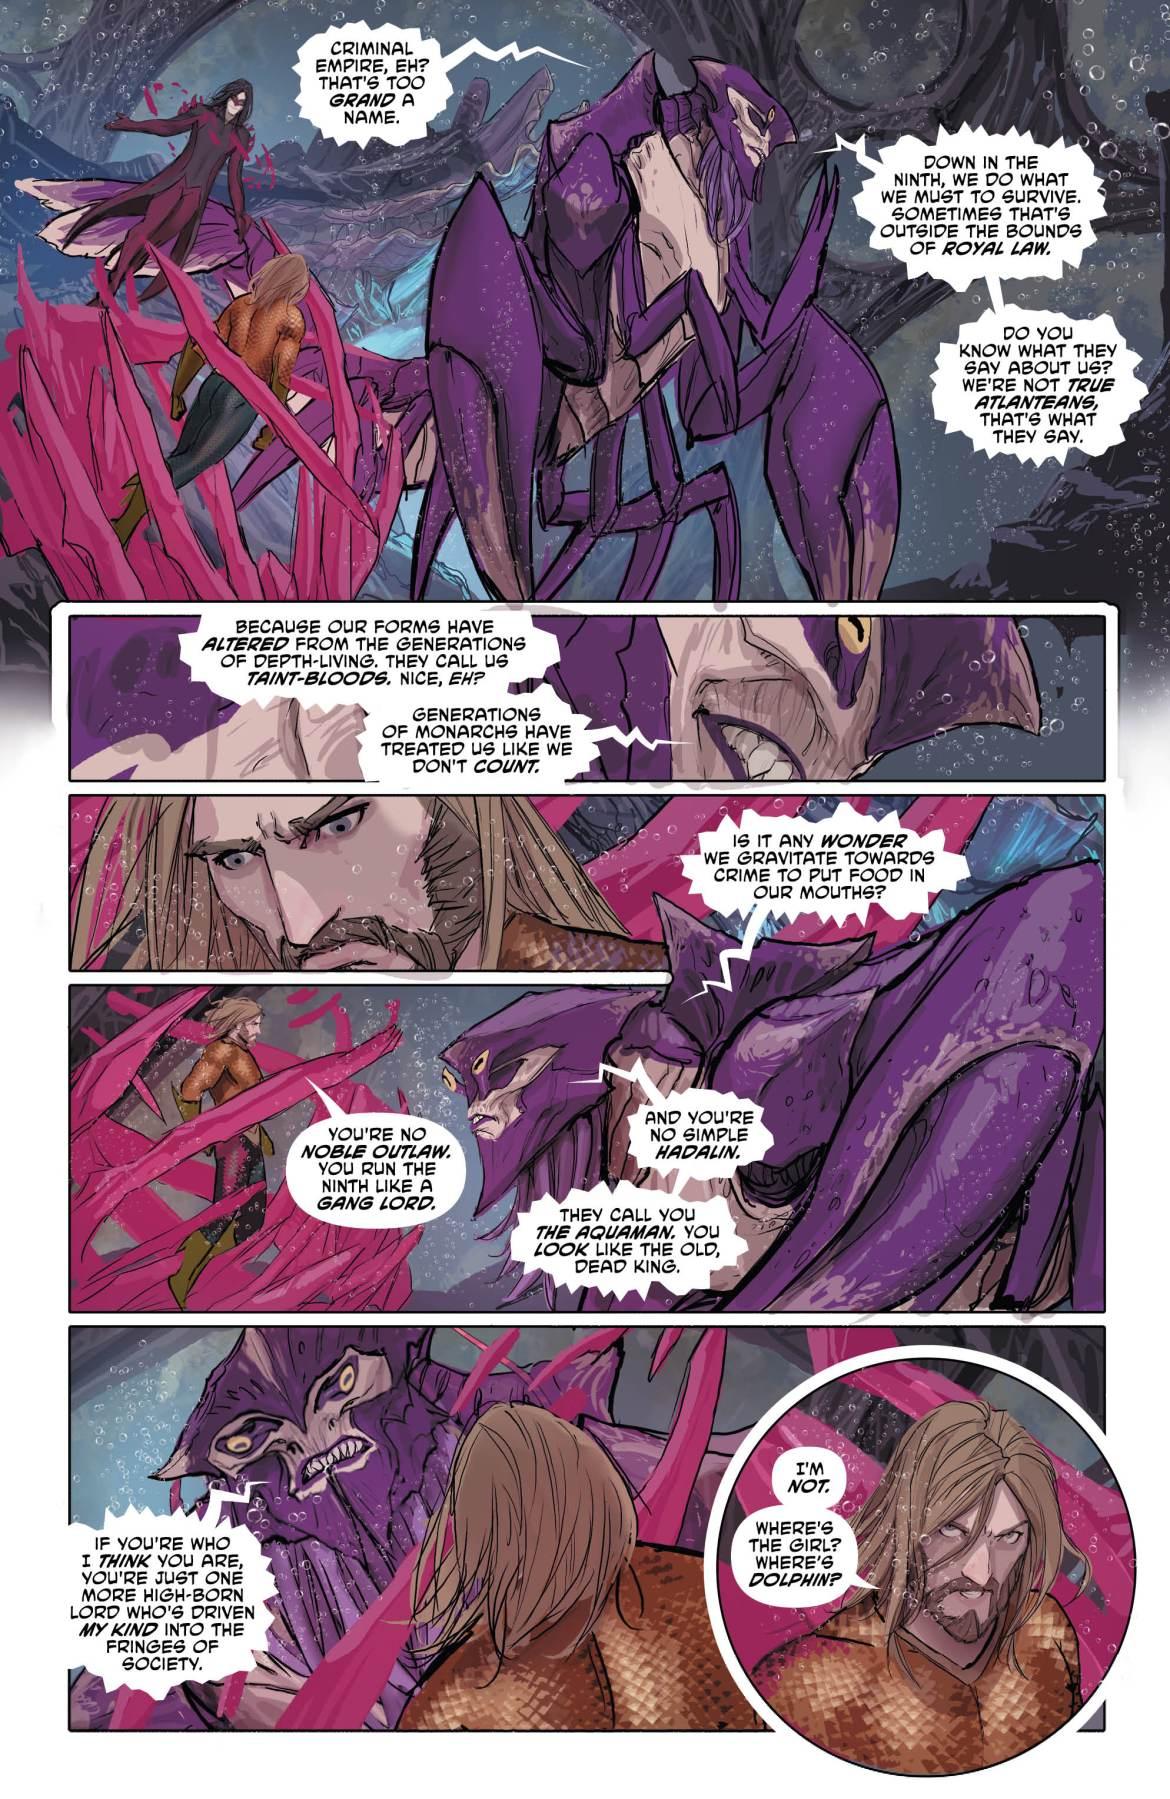 Aquaman Page 4 - DC Comics News